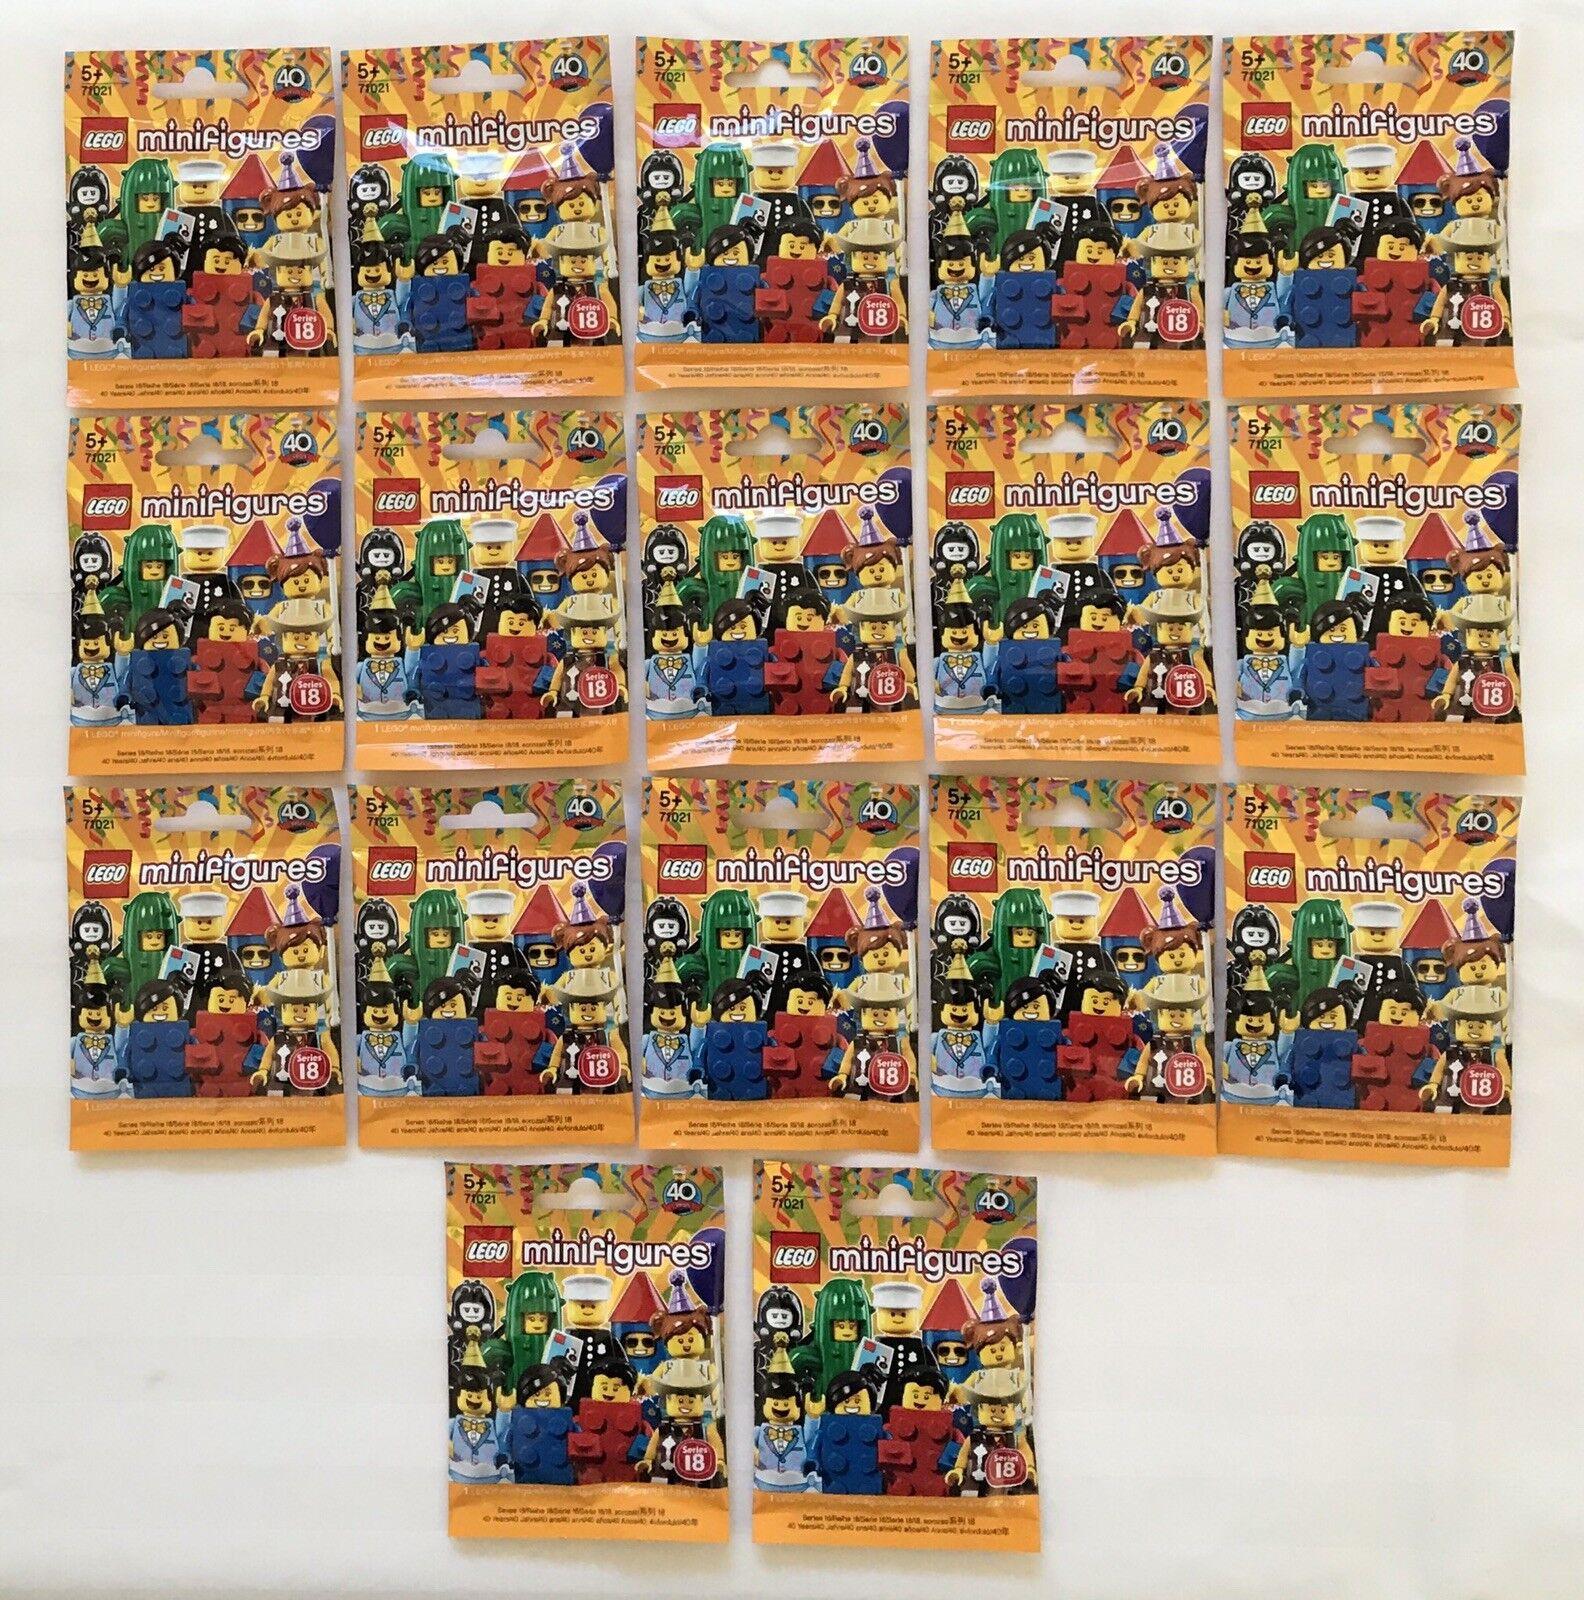 LEGO MINIcifraS (71021)- Series  18 -completare Set of 17 cifras - Factory SEALED  vendita economica